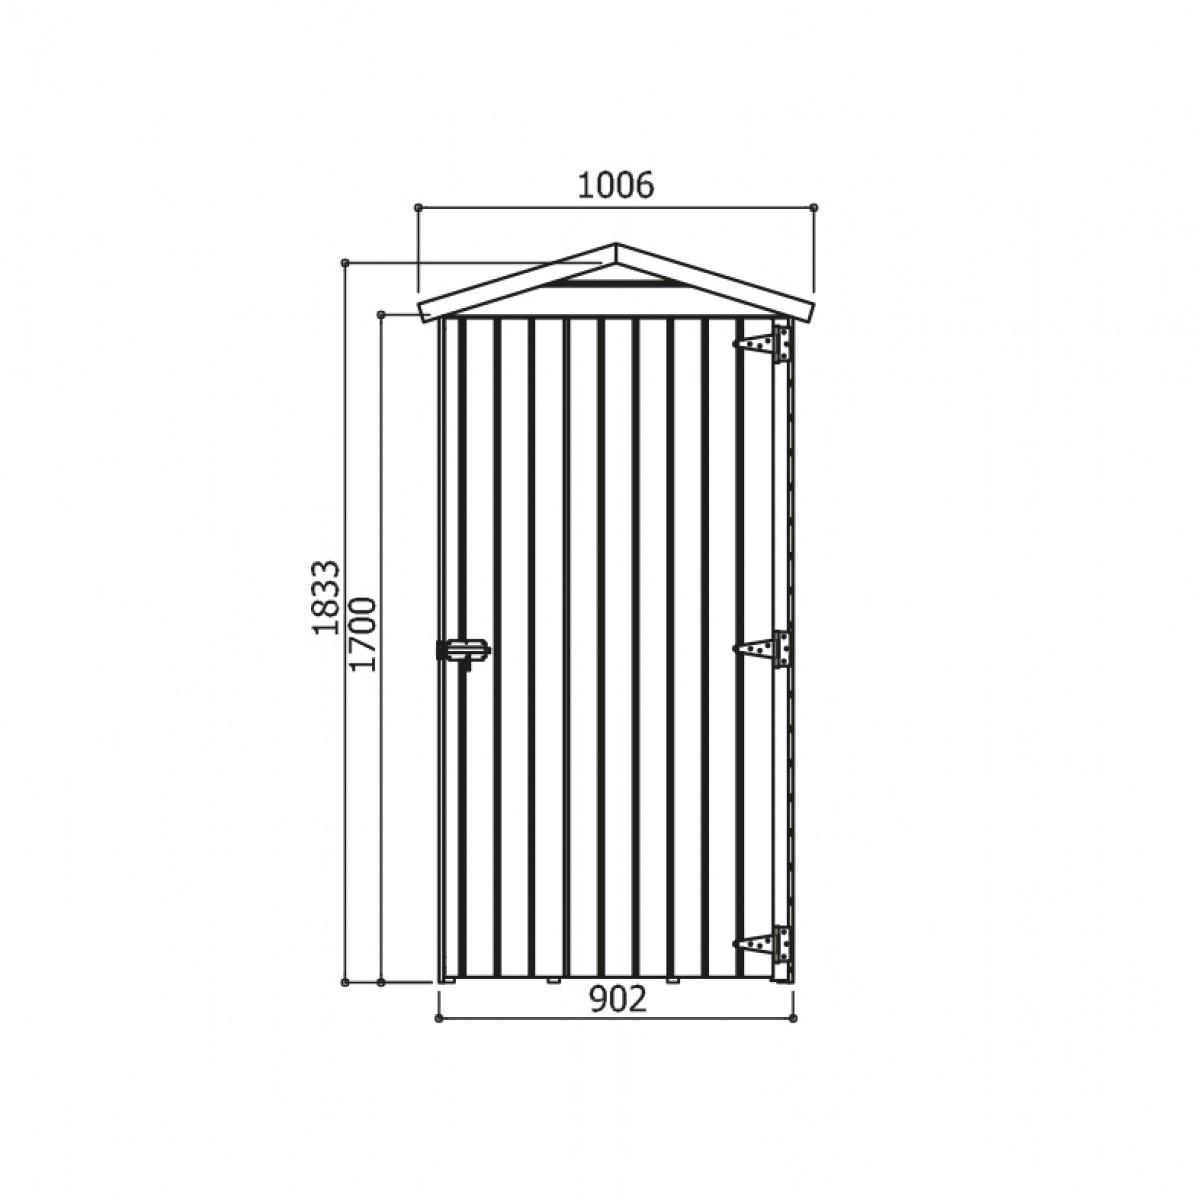 dřevěný domek SOLID ANITA 1 - 90 x 96 cm (S879-1)